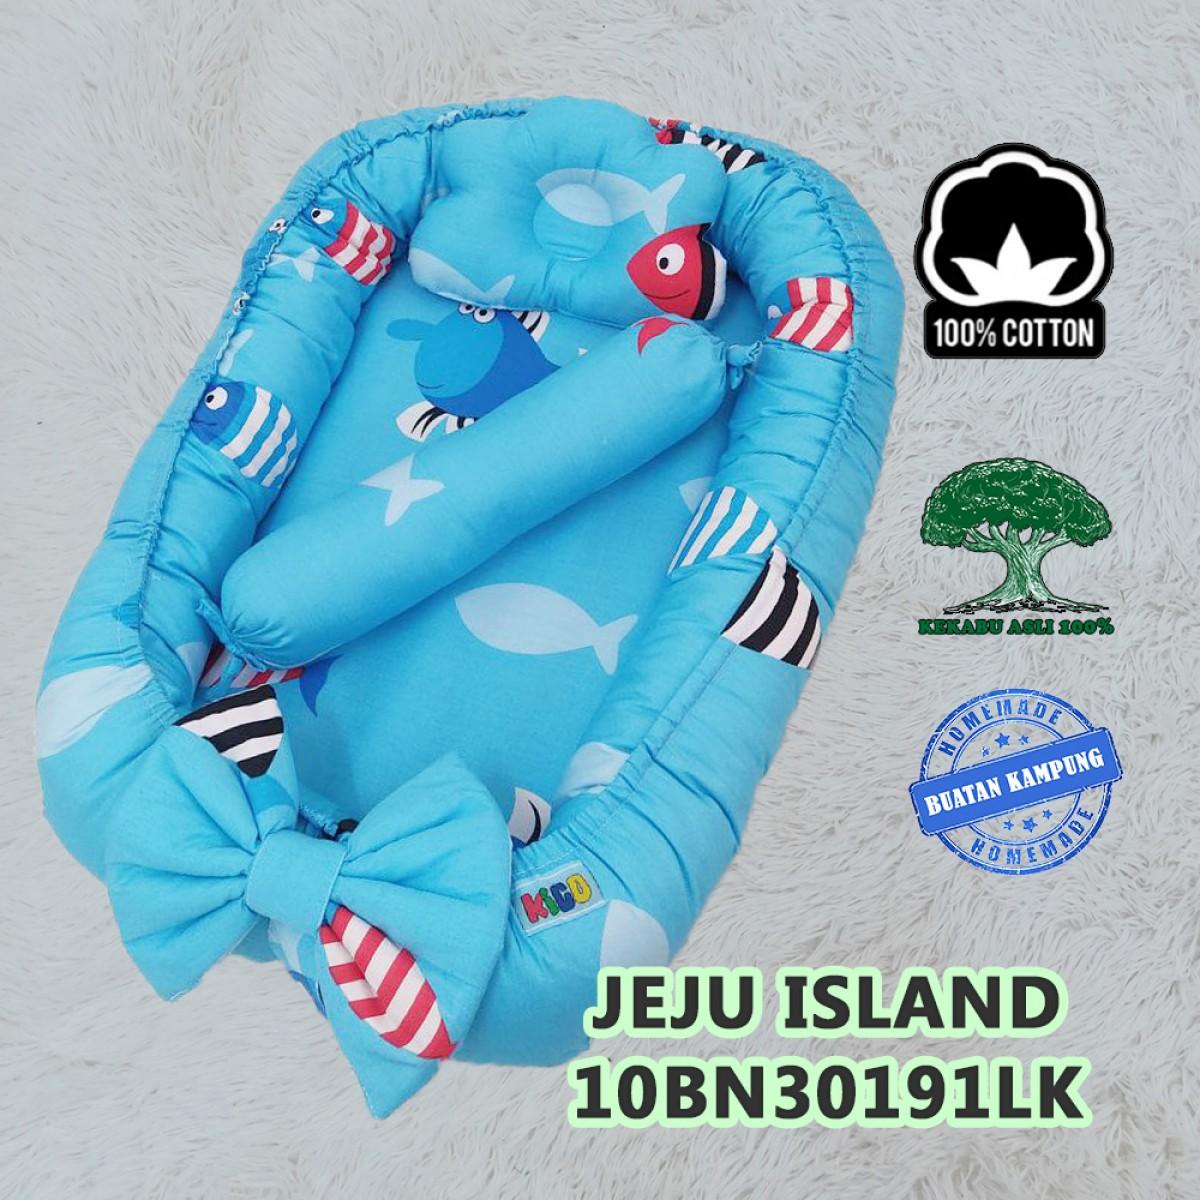 Jeju Island - Kico Baby Center